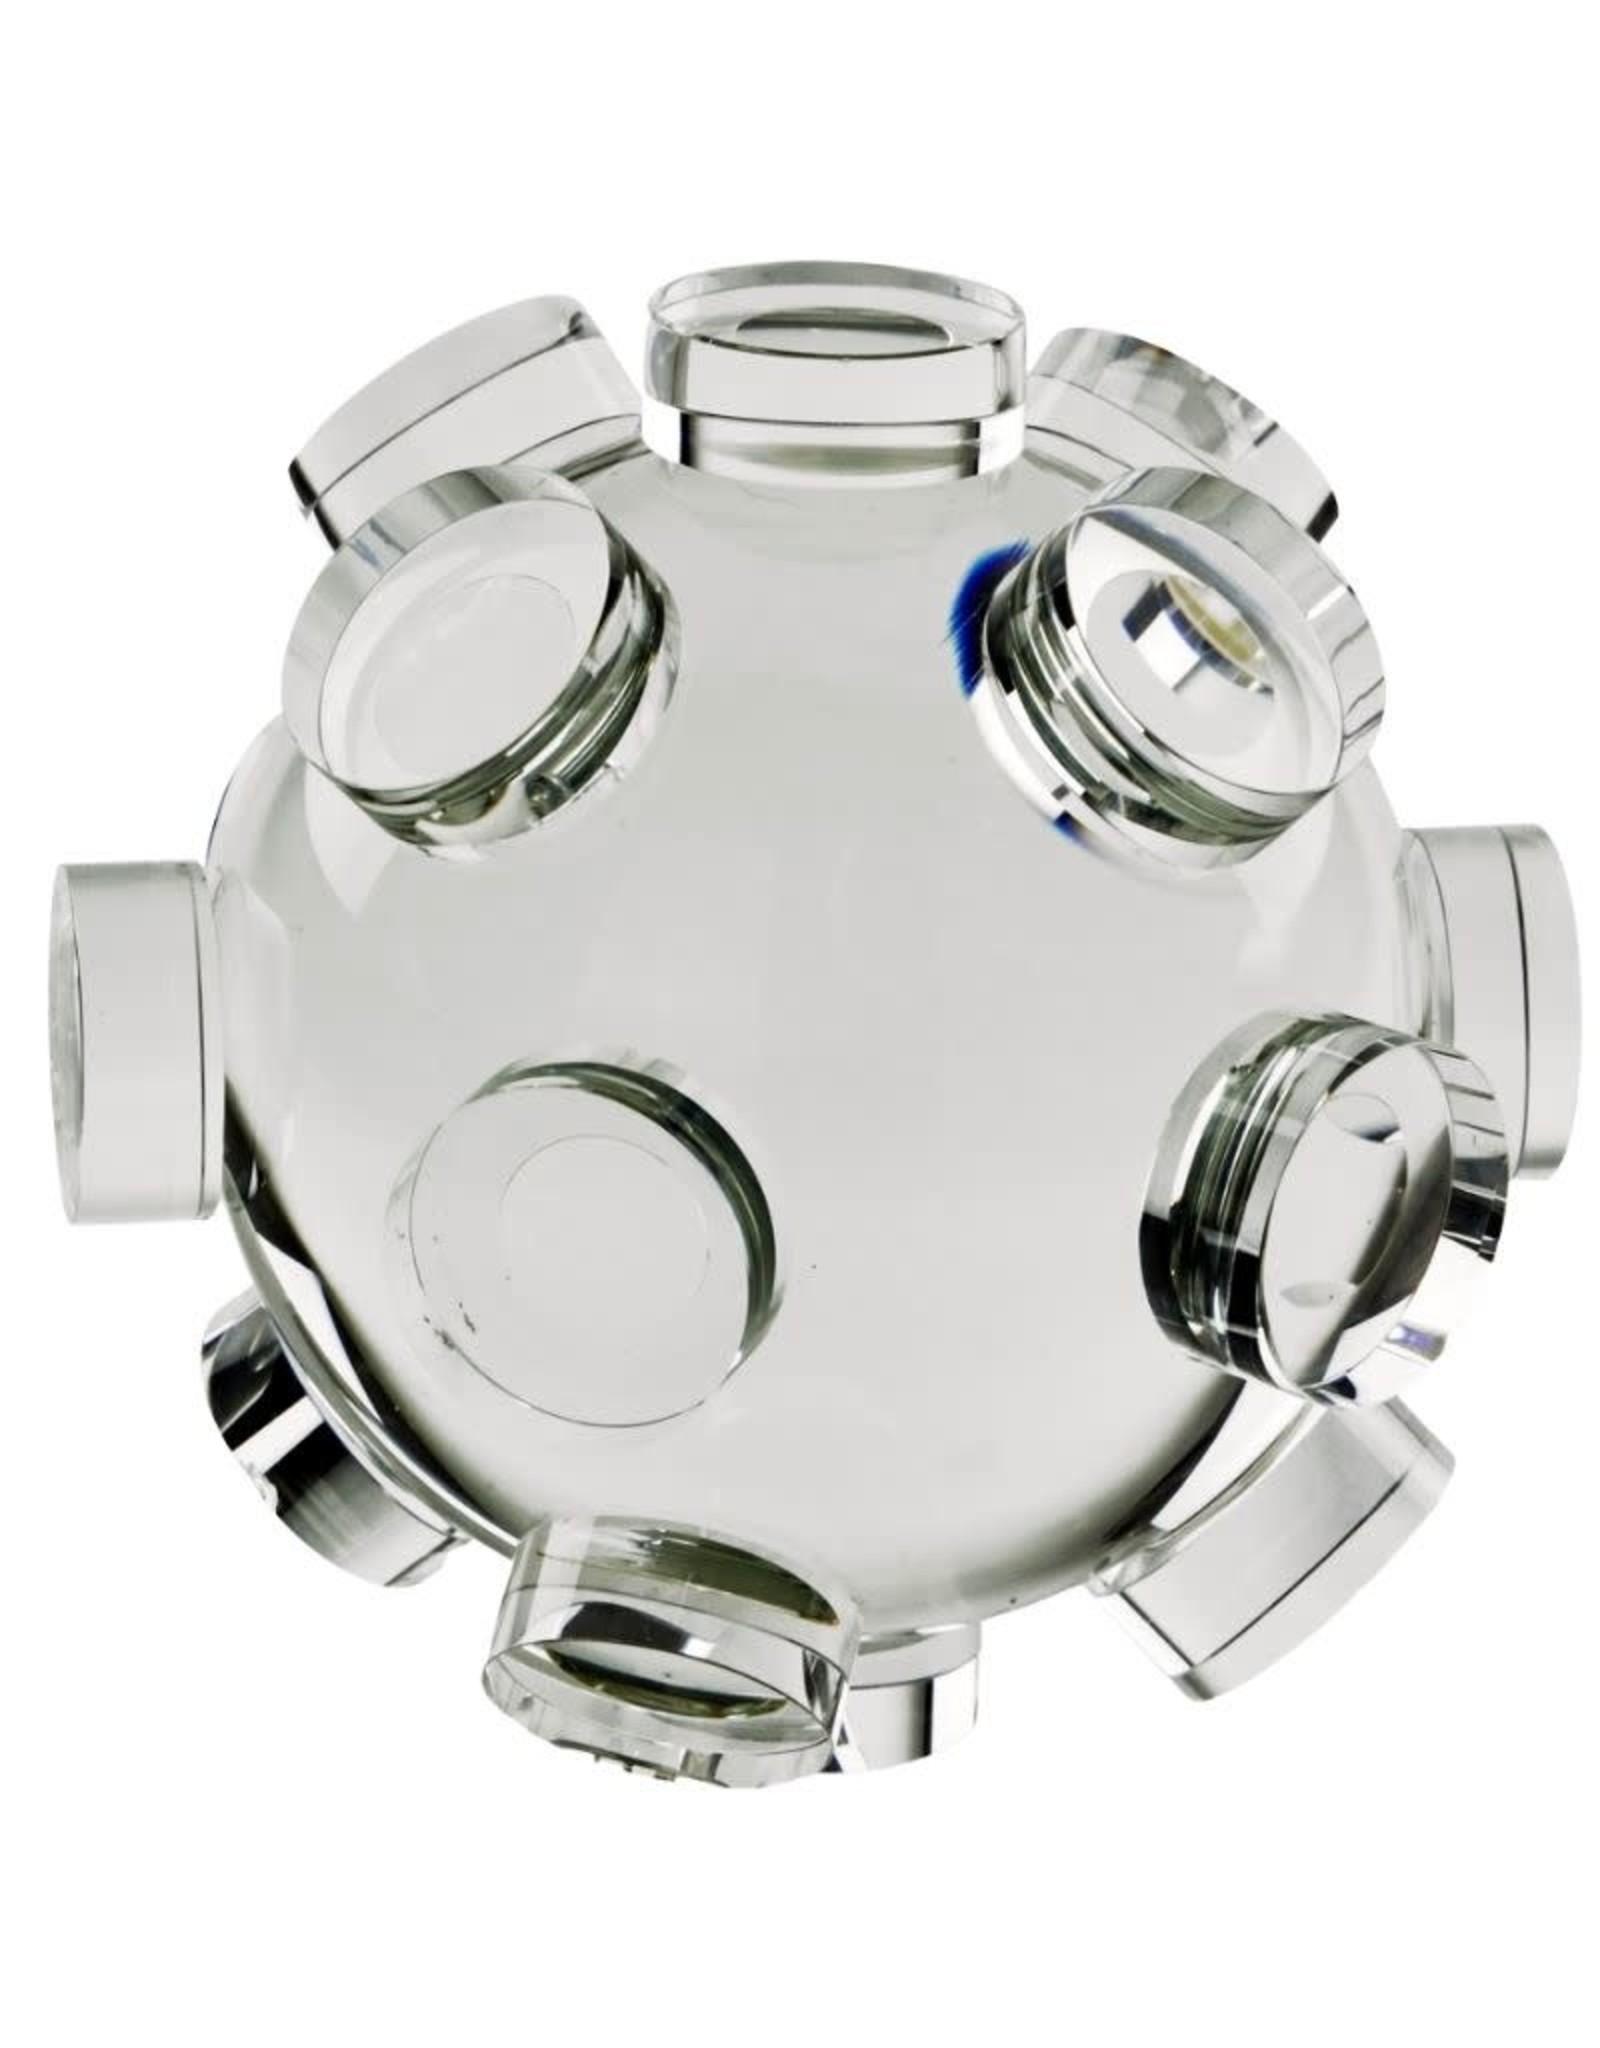 Neutron Crystal Sculpture